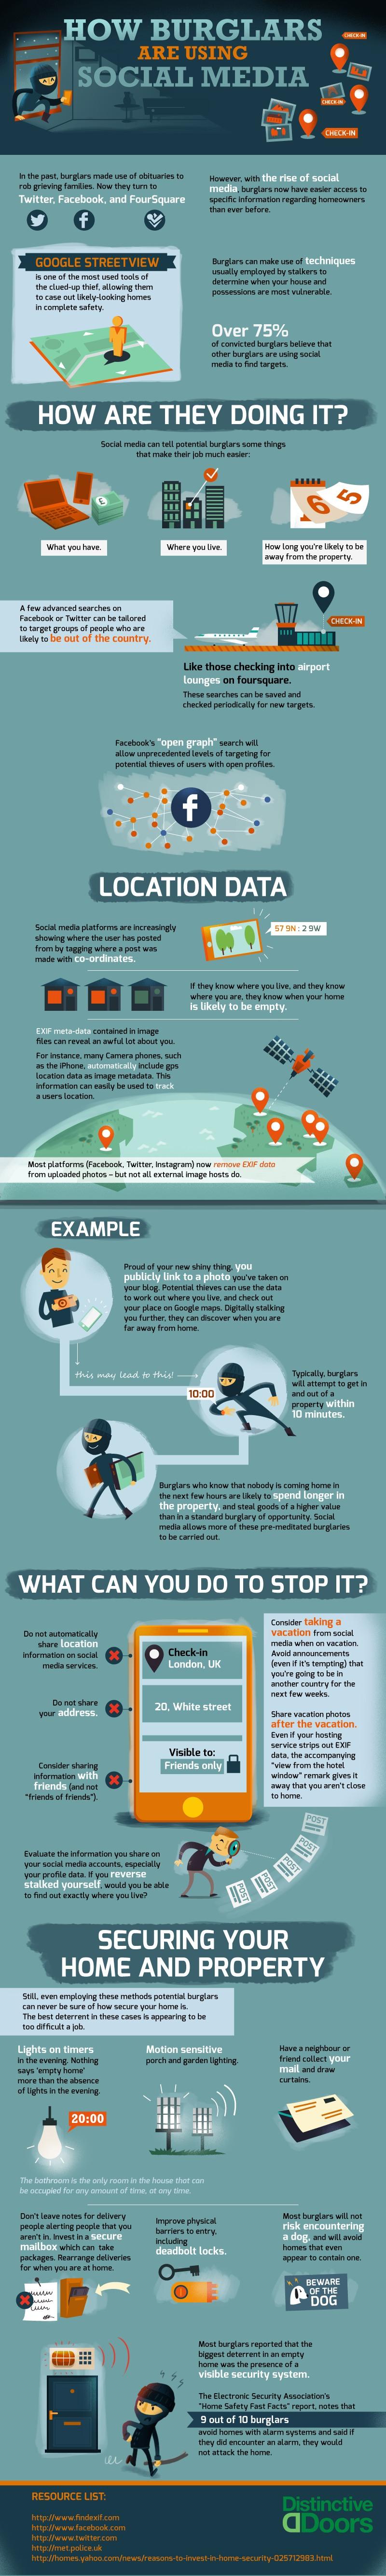 social_media_dangers_infographic